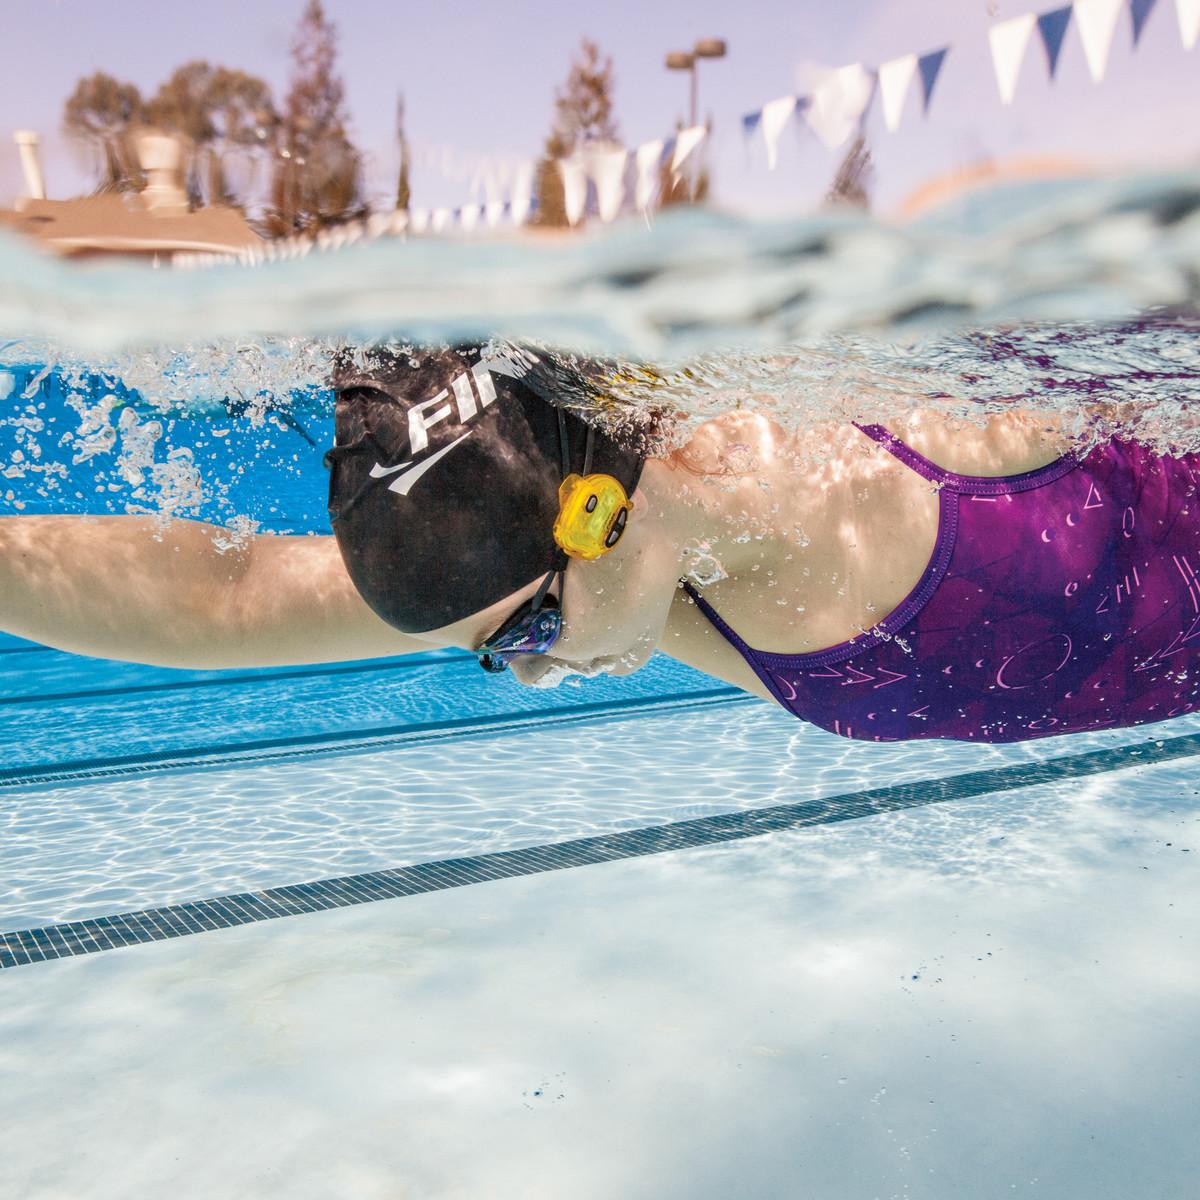 Finis_Tempo-Trainer_swimming